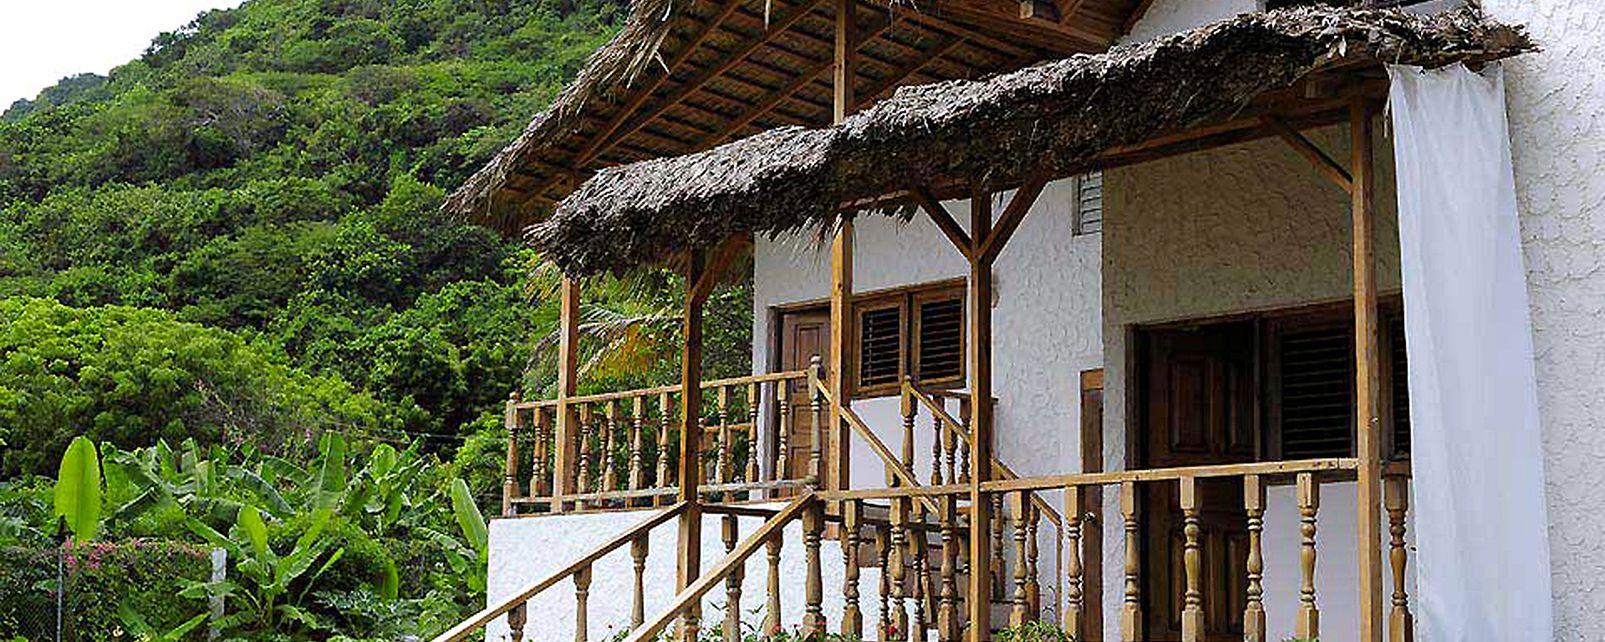 Hotel La Mamie River Beach House